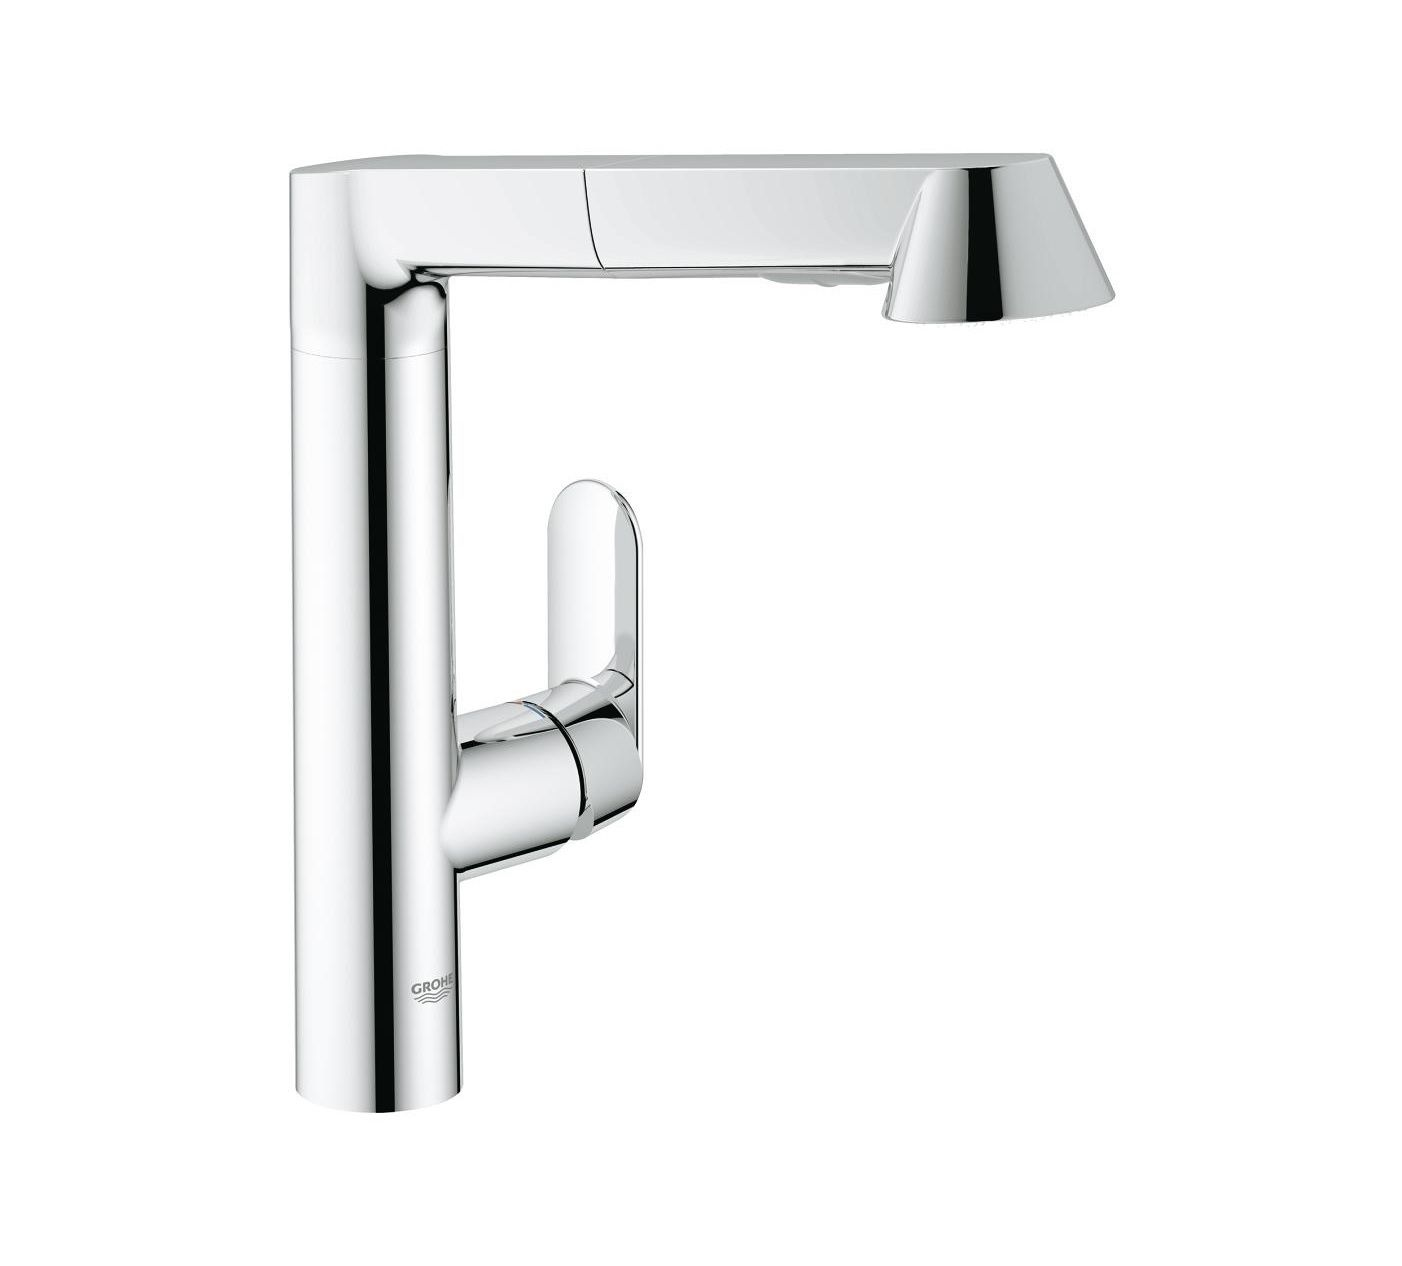 grohe kitchen faucet k7 32178000 dco supersteel